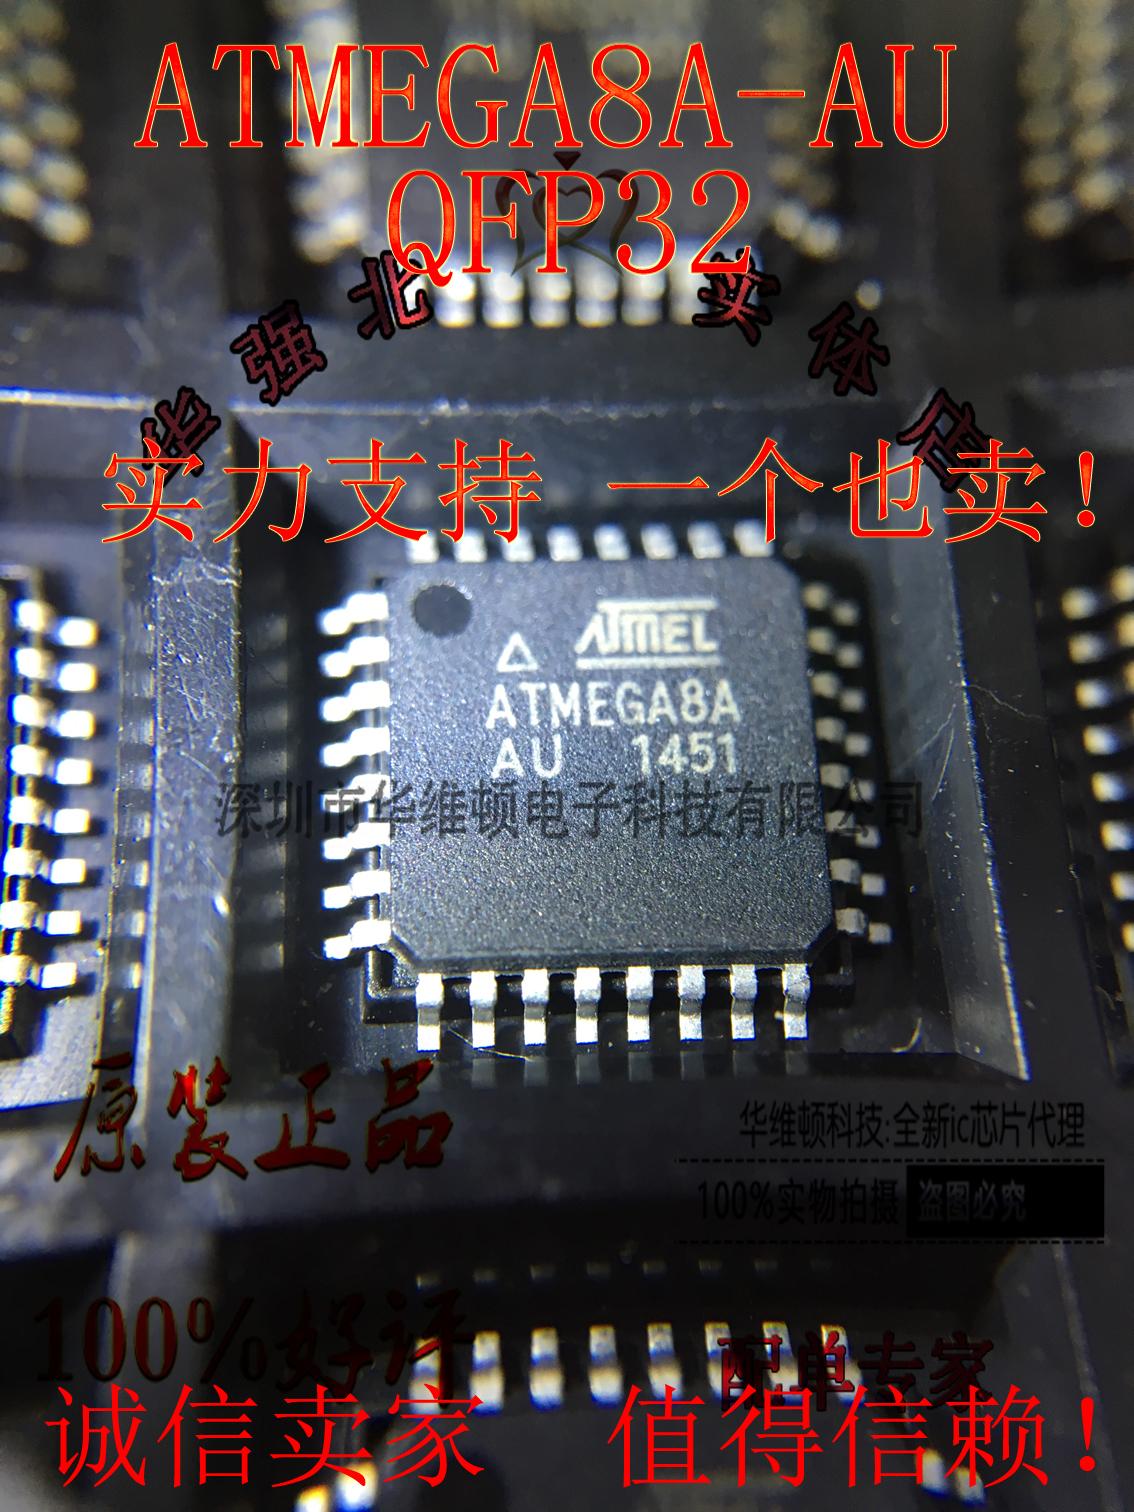 ATMEGA8A-AU ATMEGA8A TQFP-32 ATMEL one agent original original packaging  microcontroller